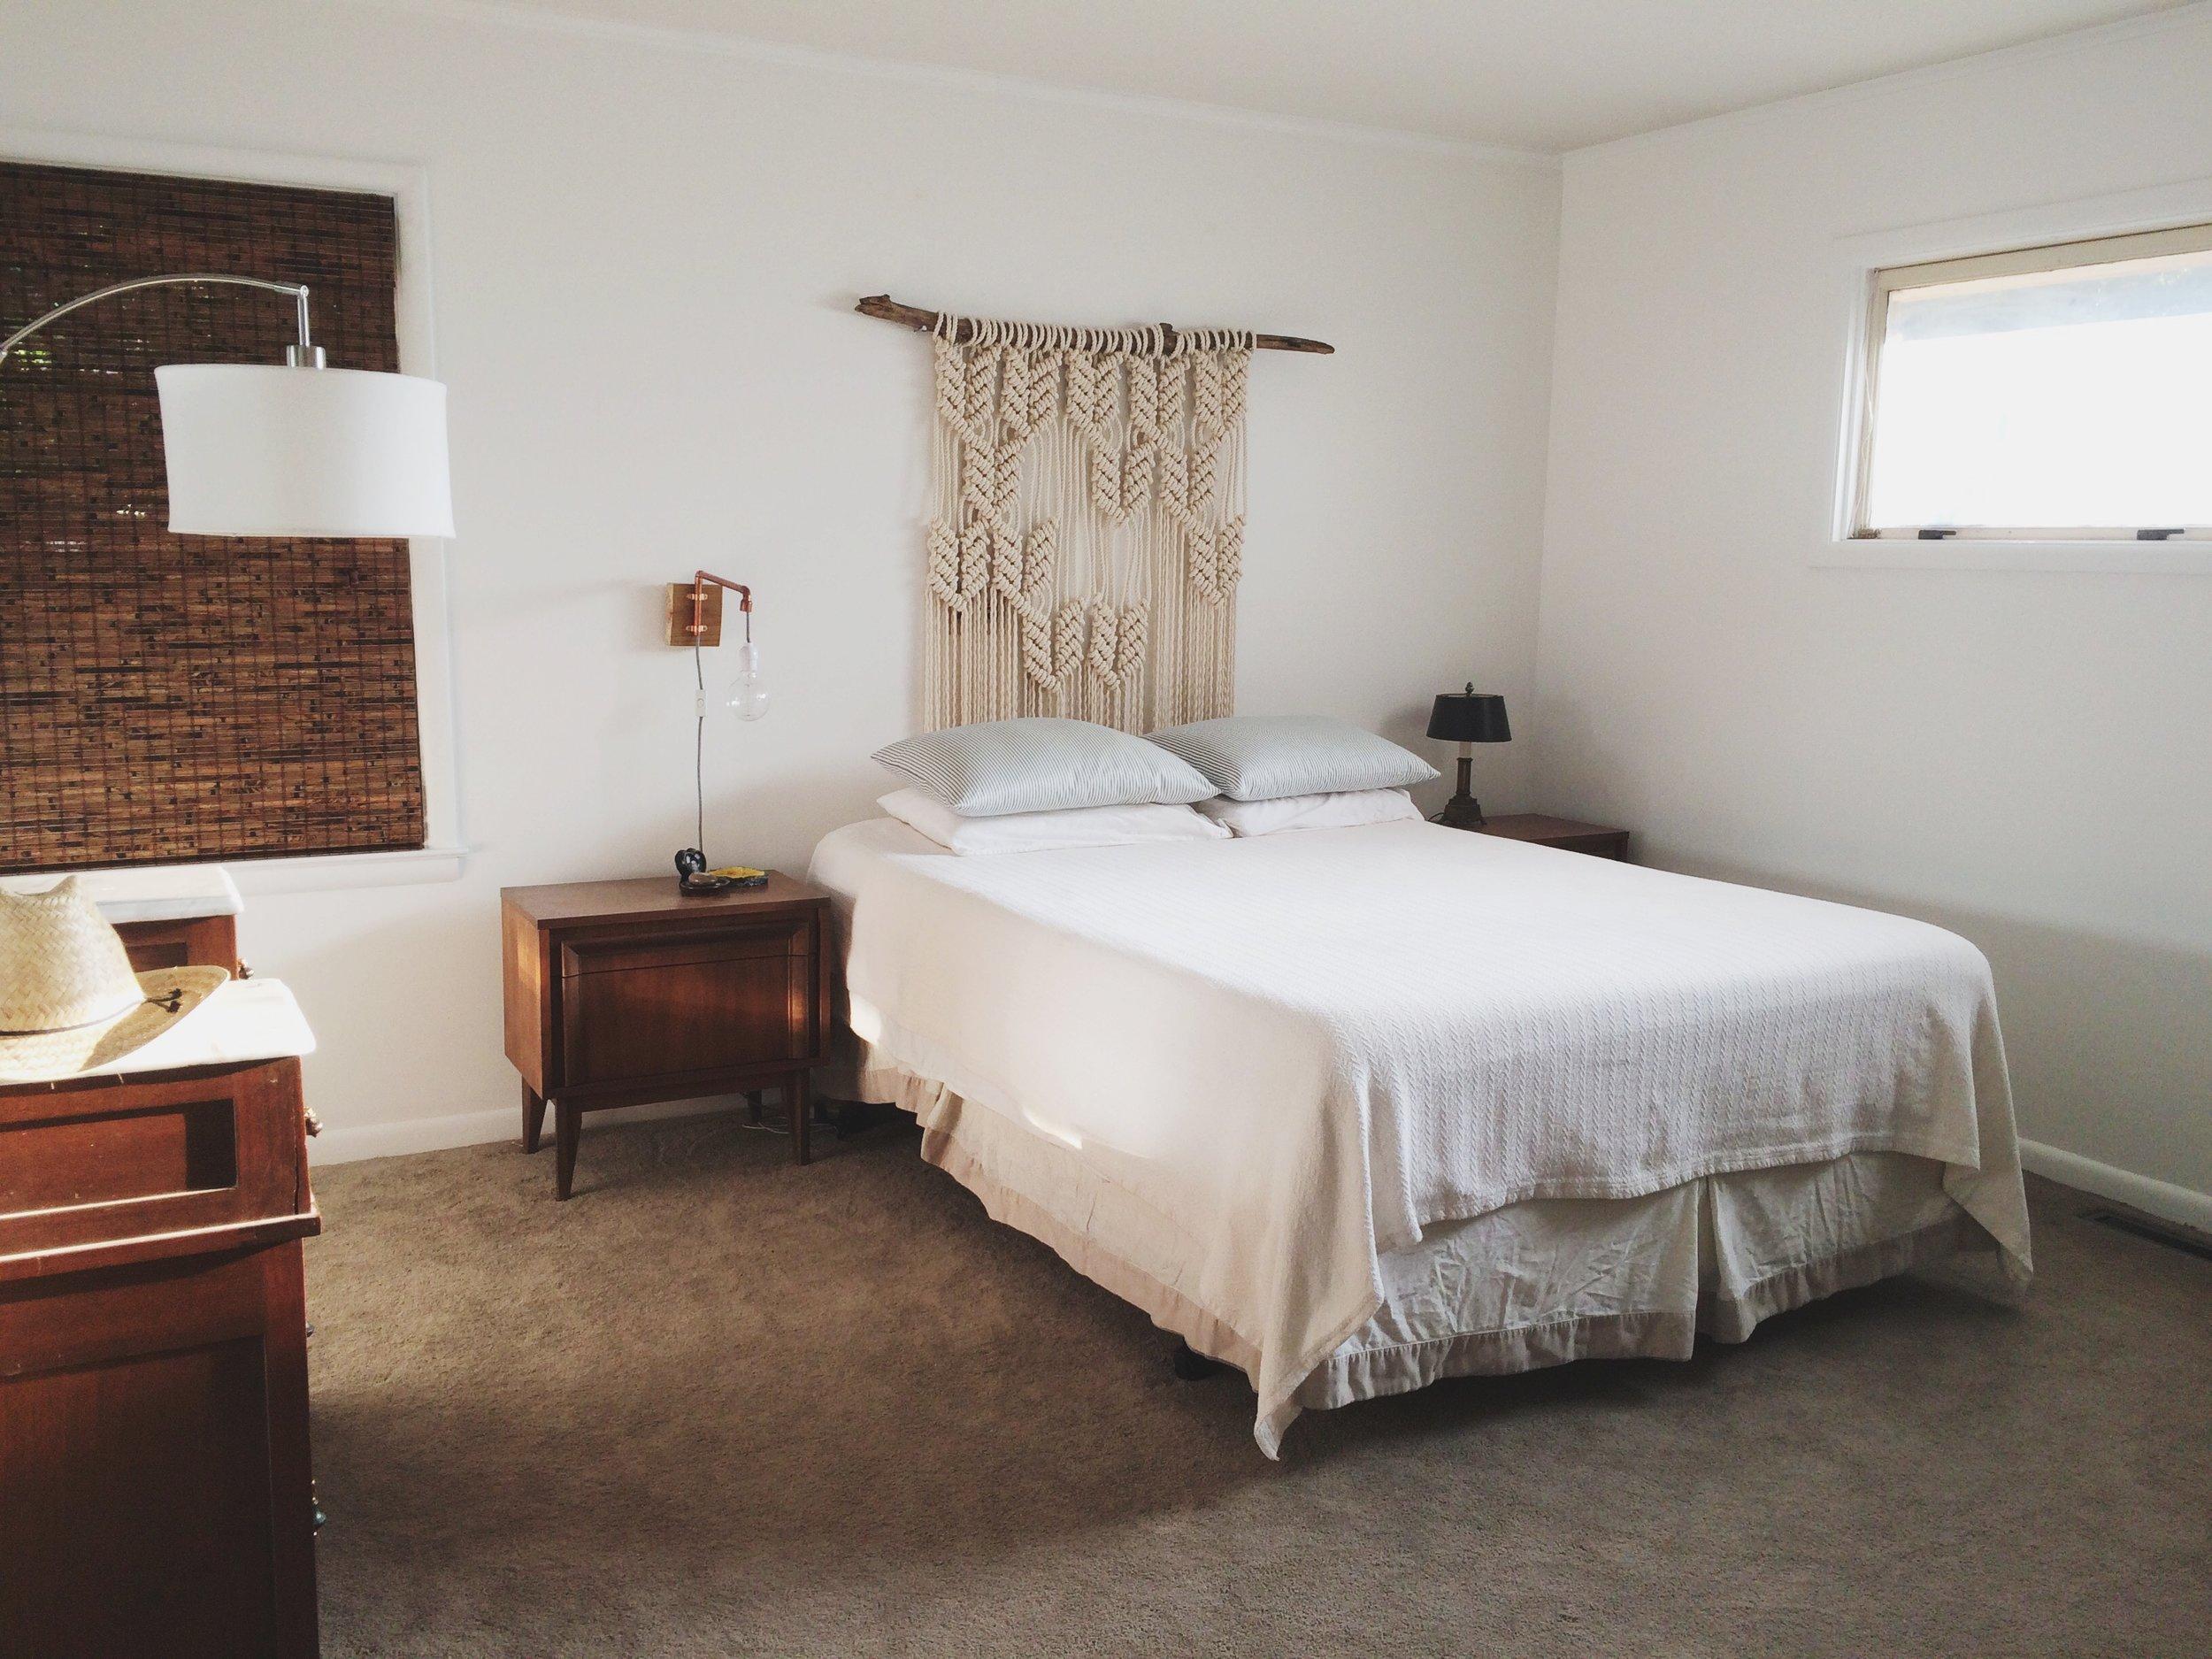 macrame-headboard-bedroom